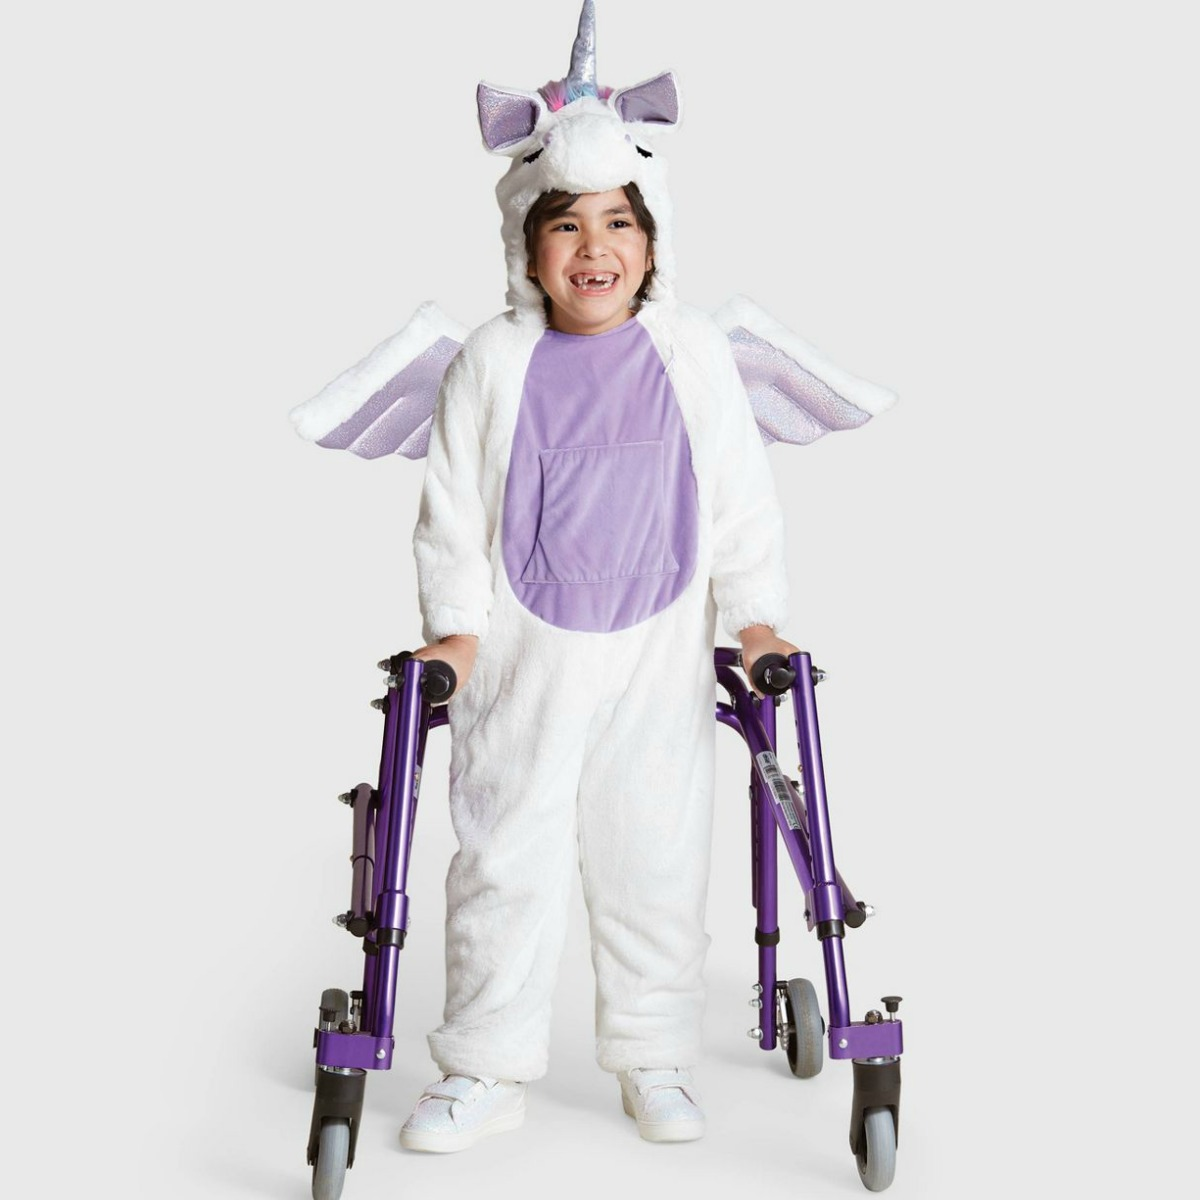 Girl wearing a unicorn costume